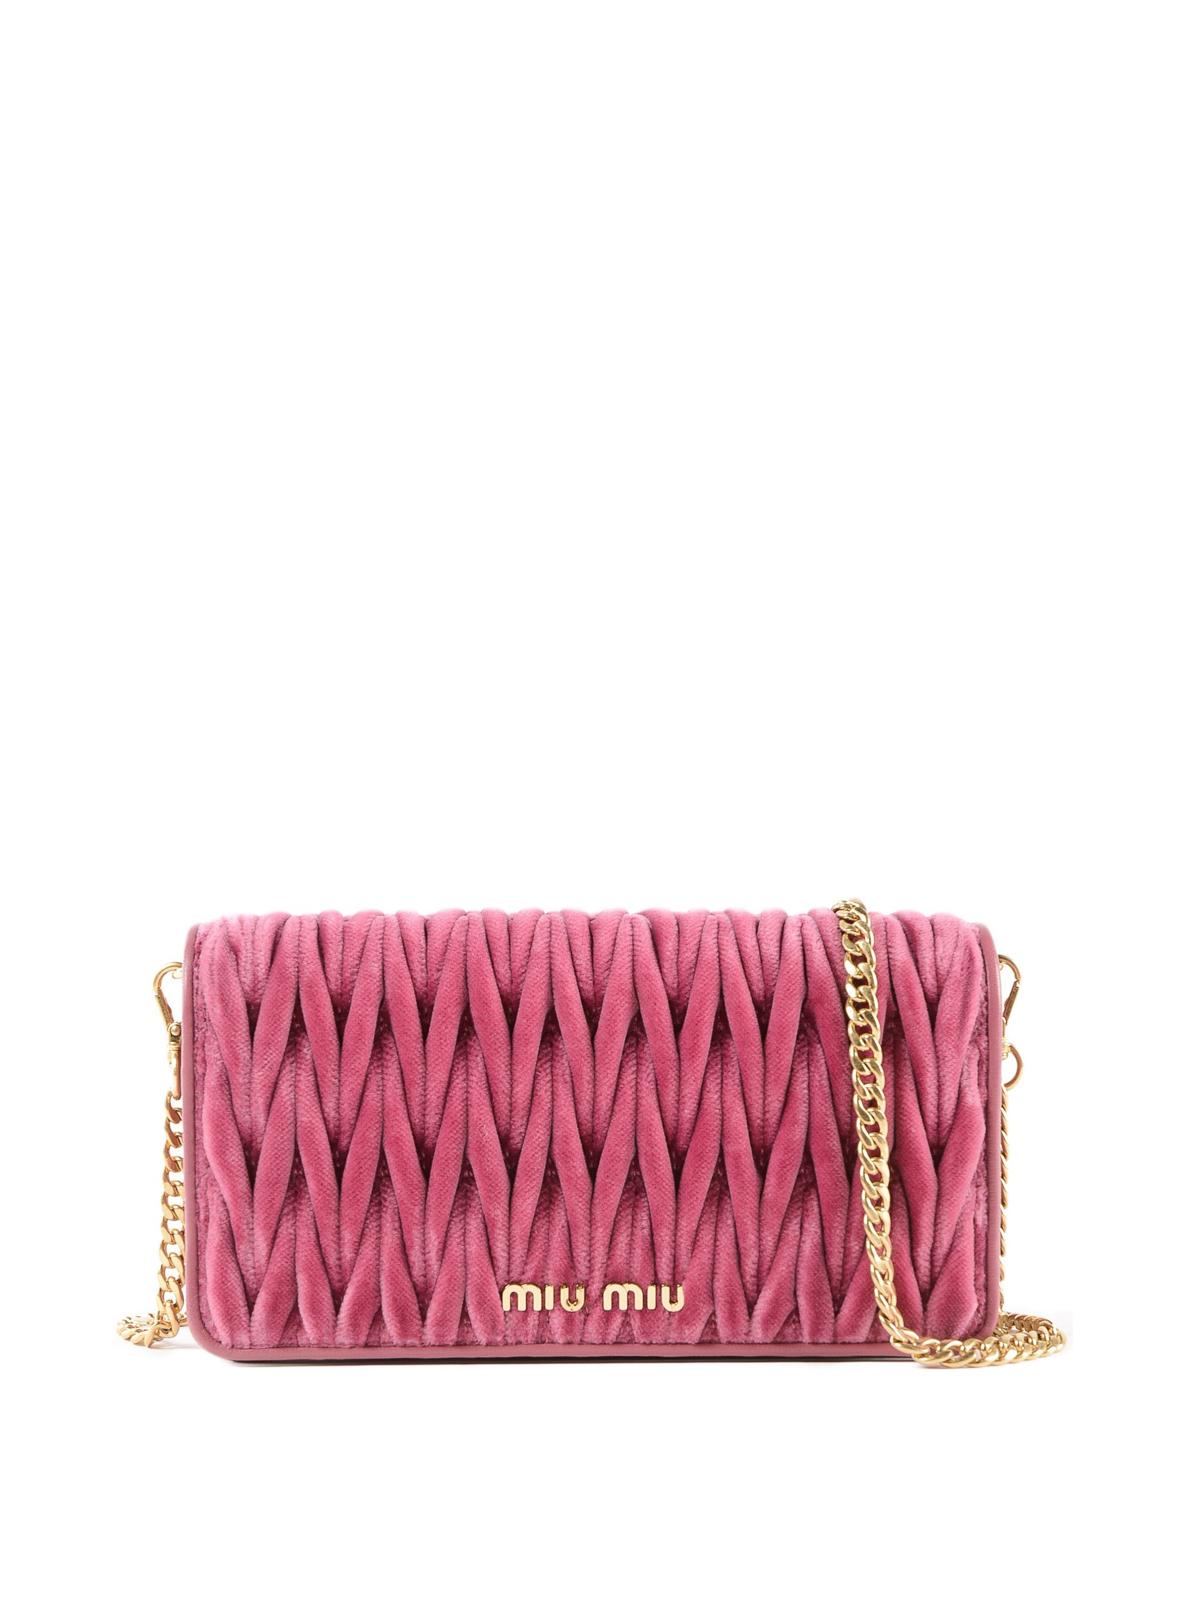 b911ee9cc90b Miu Miu - Pink matelassé velvet clutch - clutches - 5DH0442EOM 002